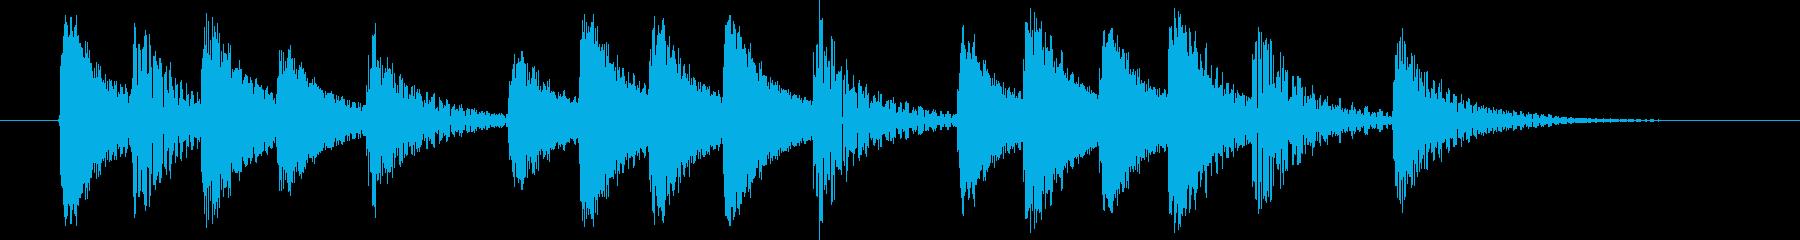 Two Drum Timbali:...の再生済みの波形